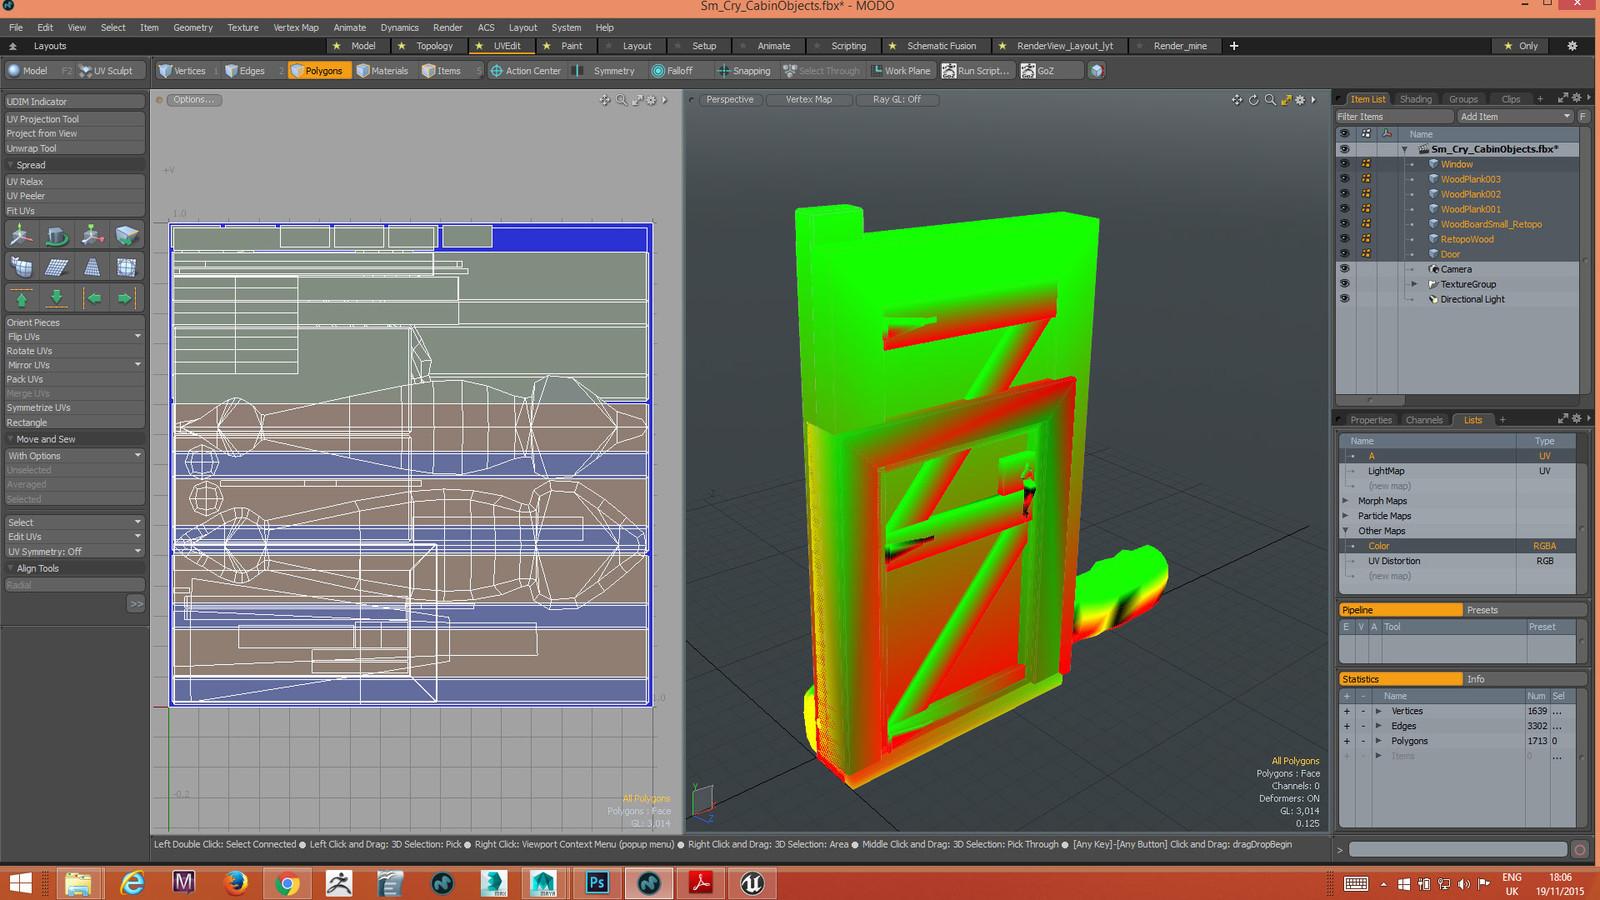 Door, Window and wood planks to be duplicated in scene